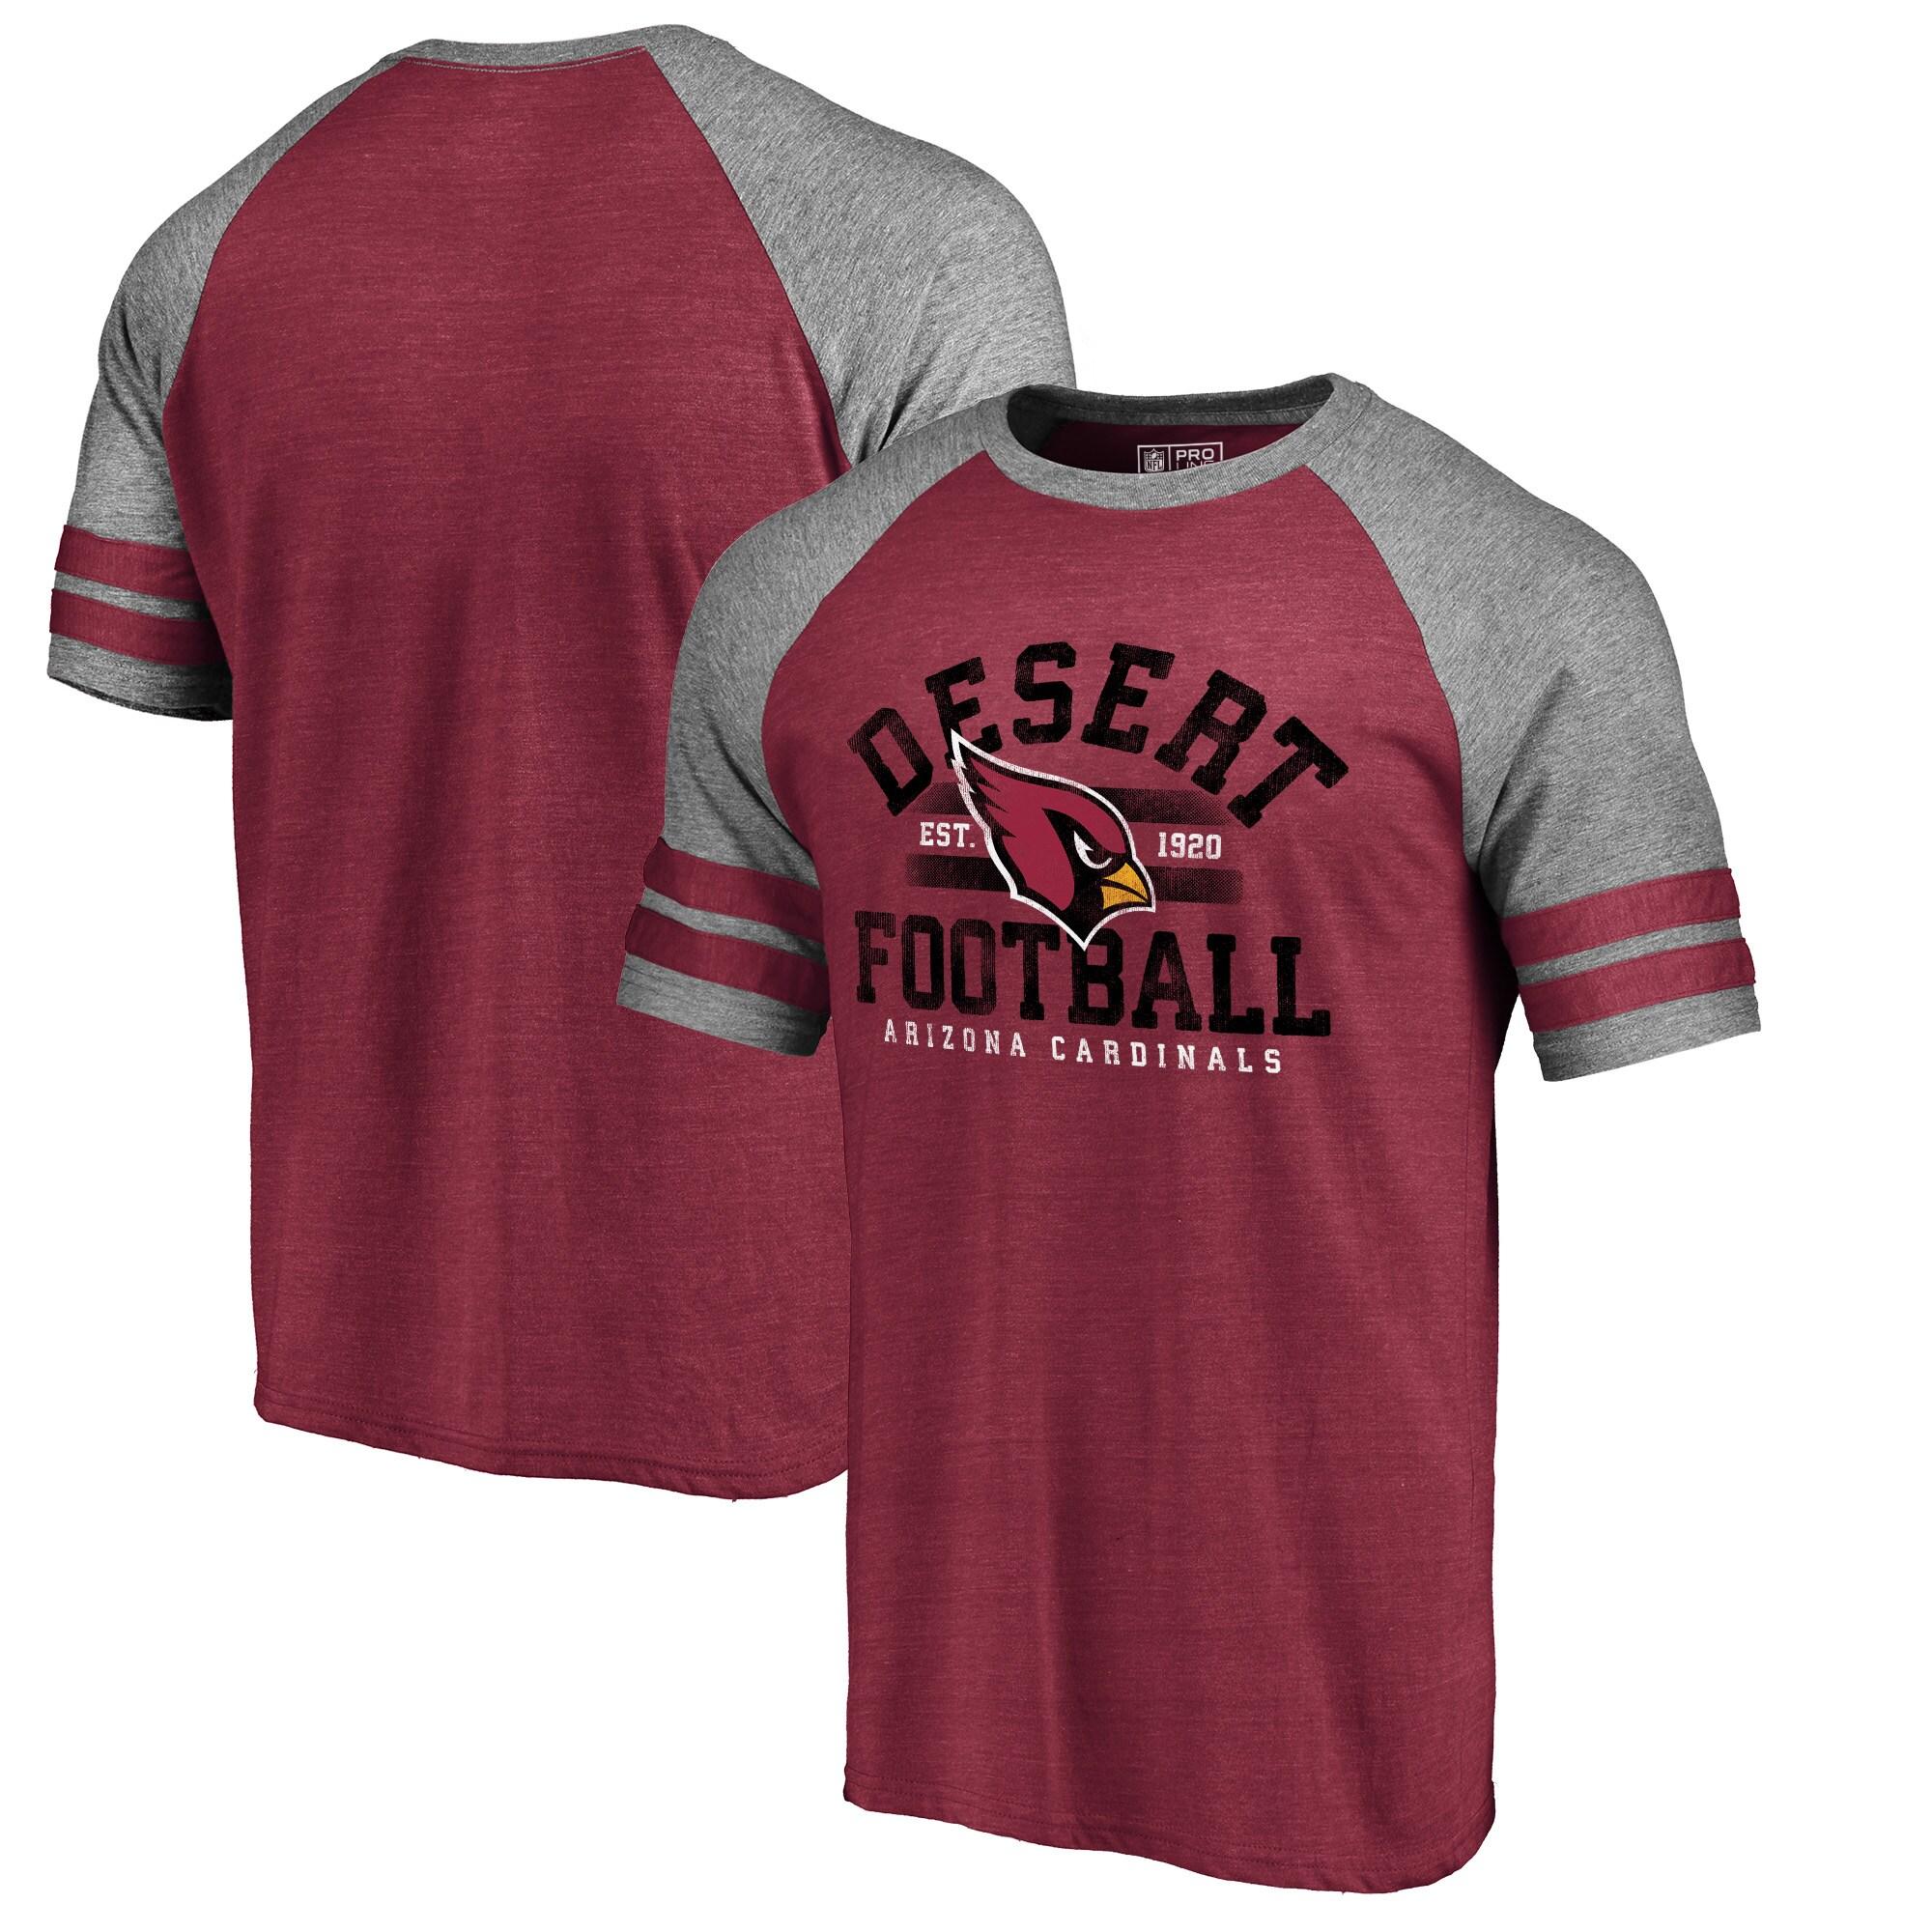 Arizona Cardinals NFL Pro Line by Fanatics Branded Hometown Collection Raglan Tri-Blend T-Shirt - Cardinal